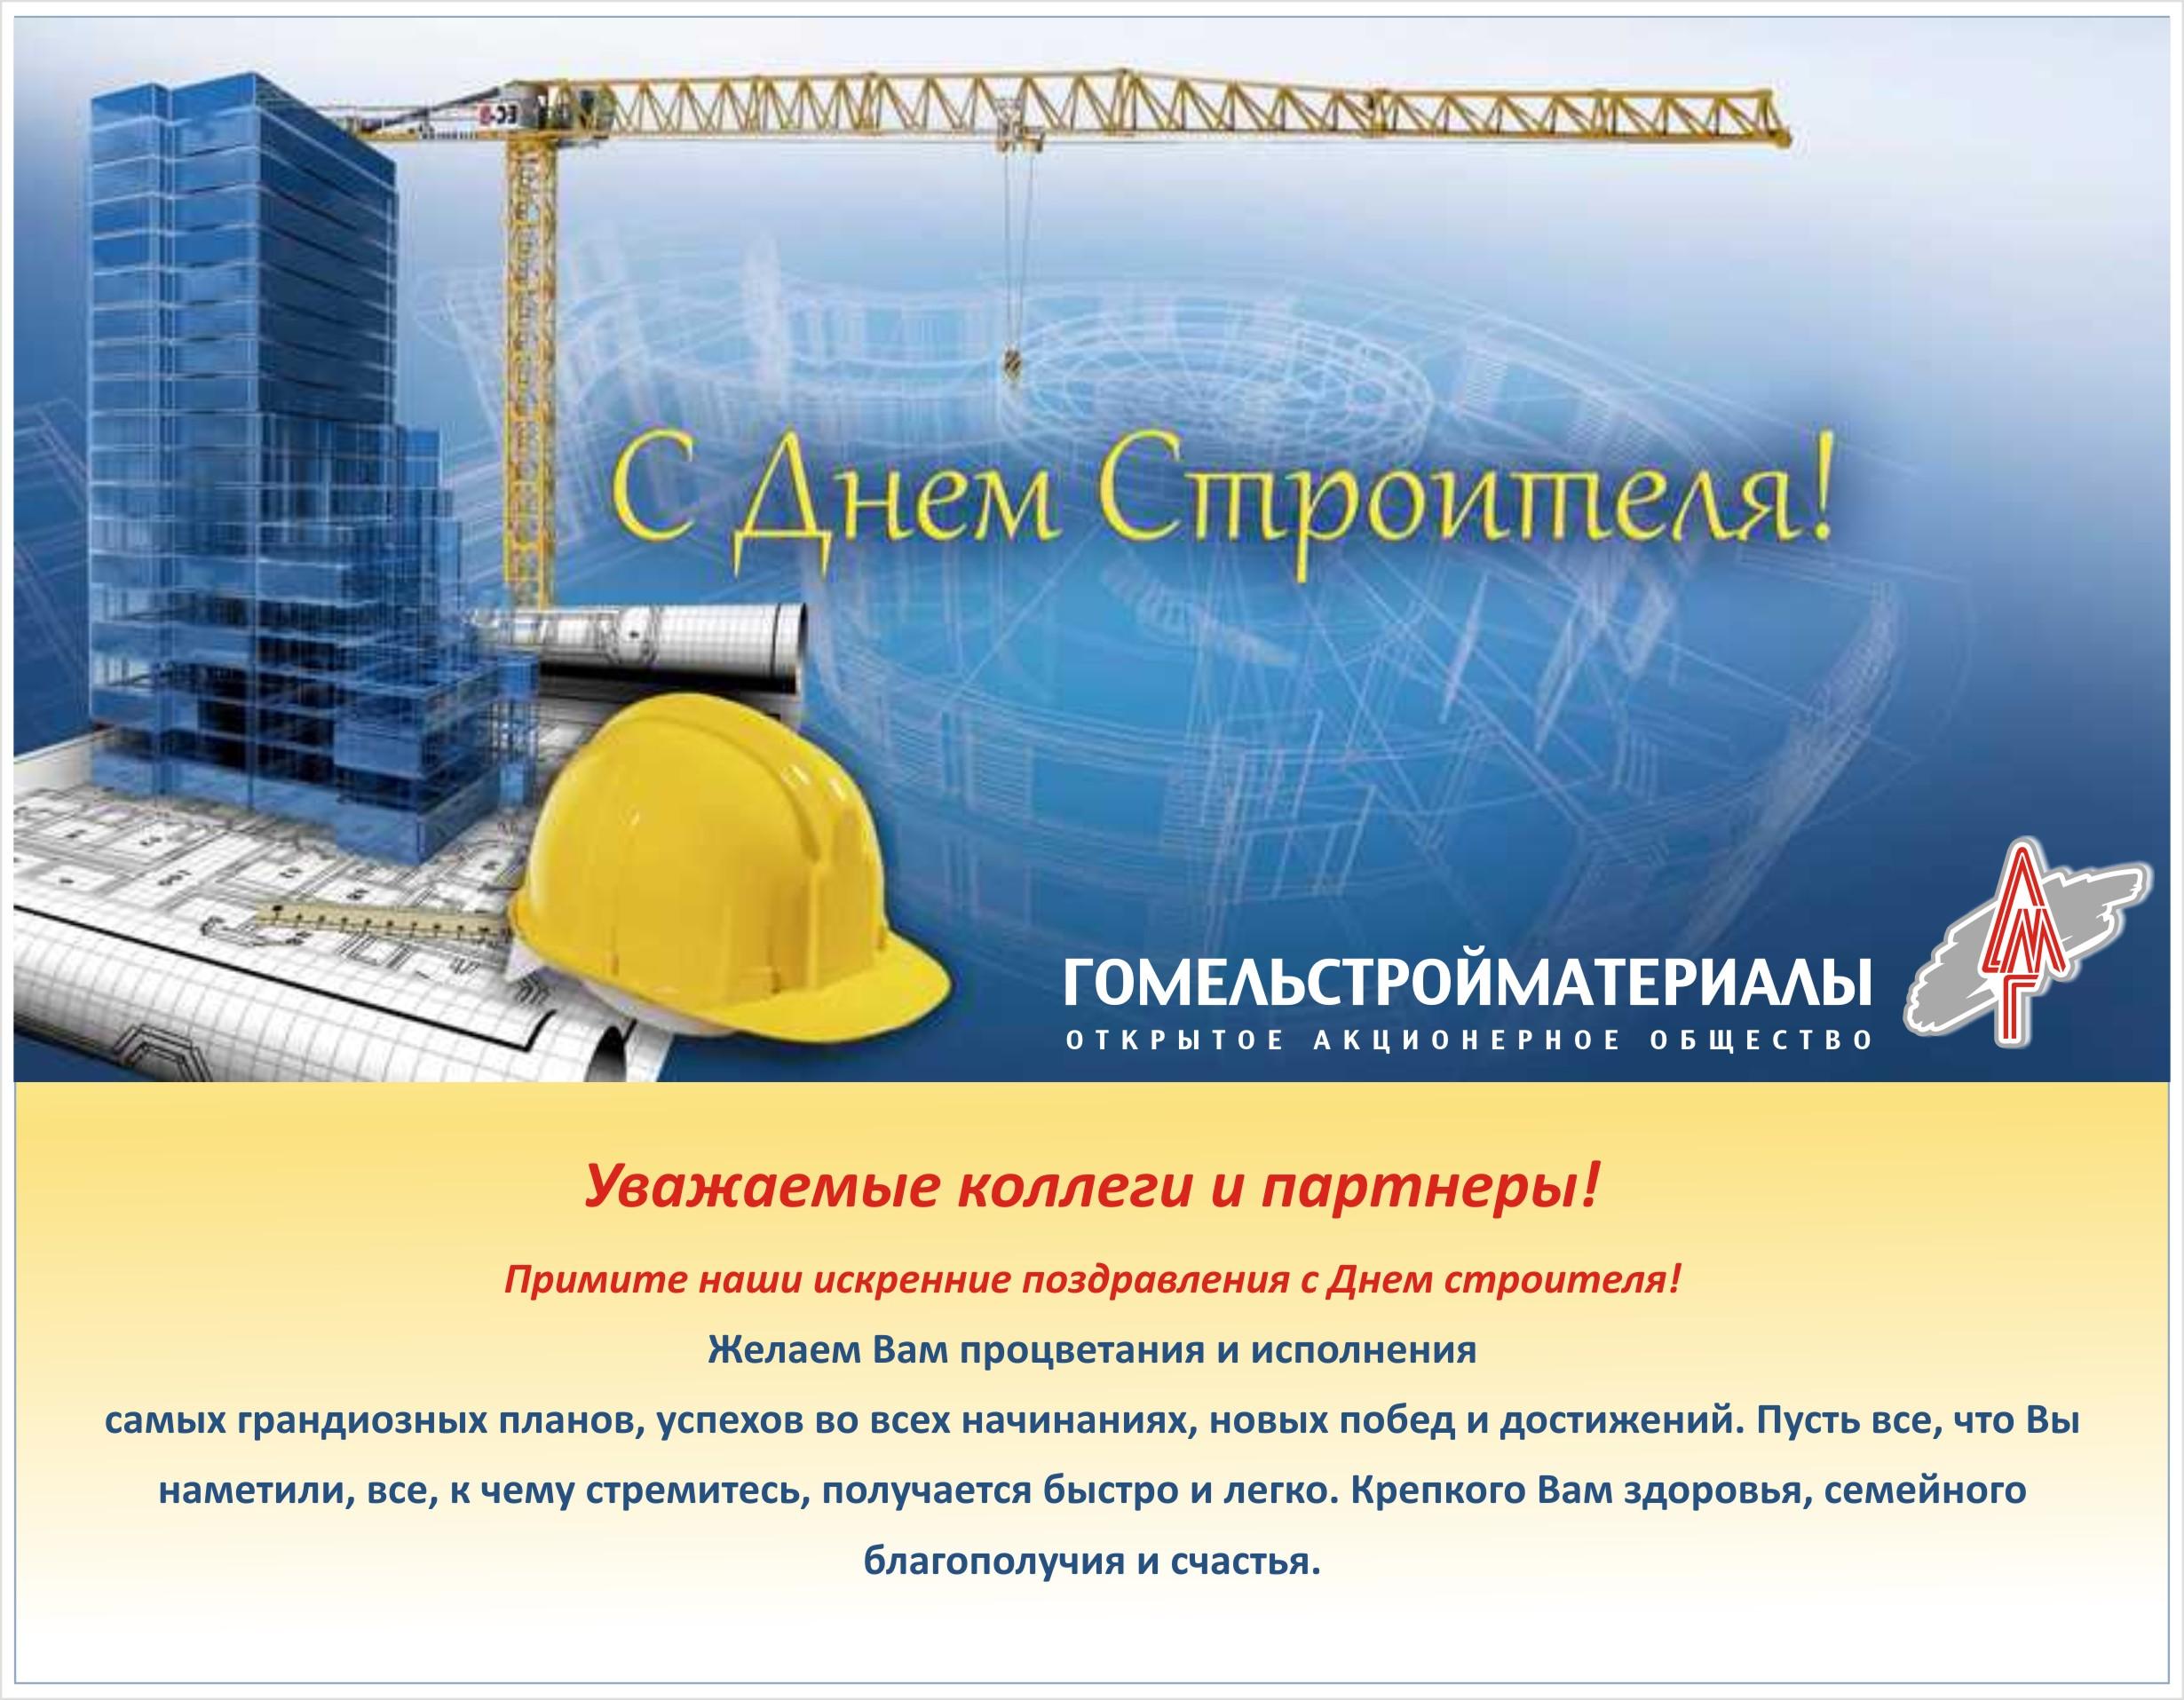 Поздравления с днем строителя от коллеги